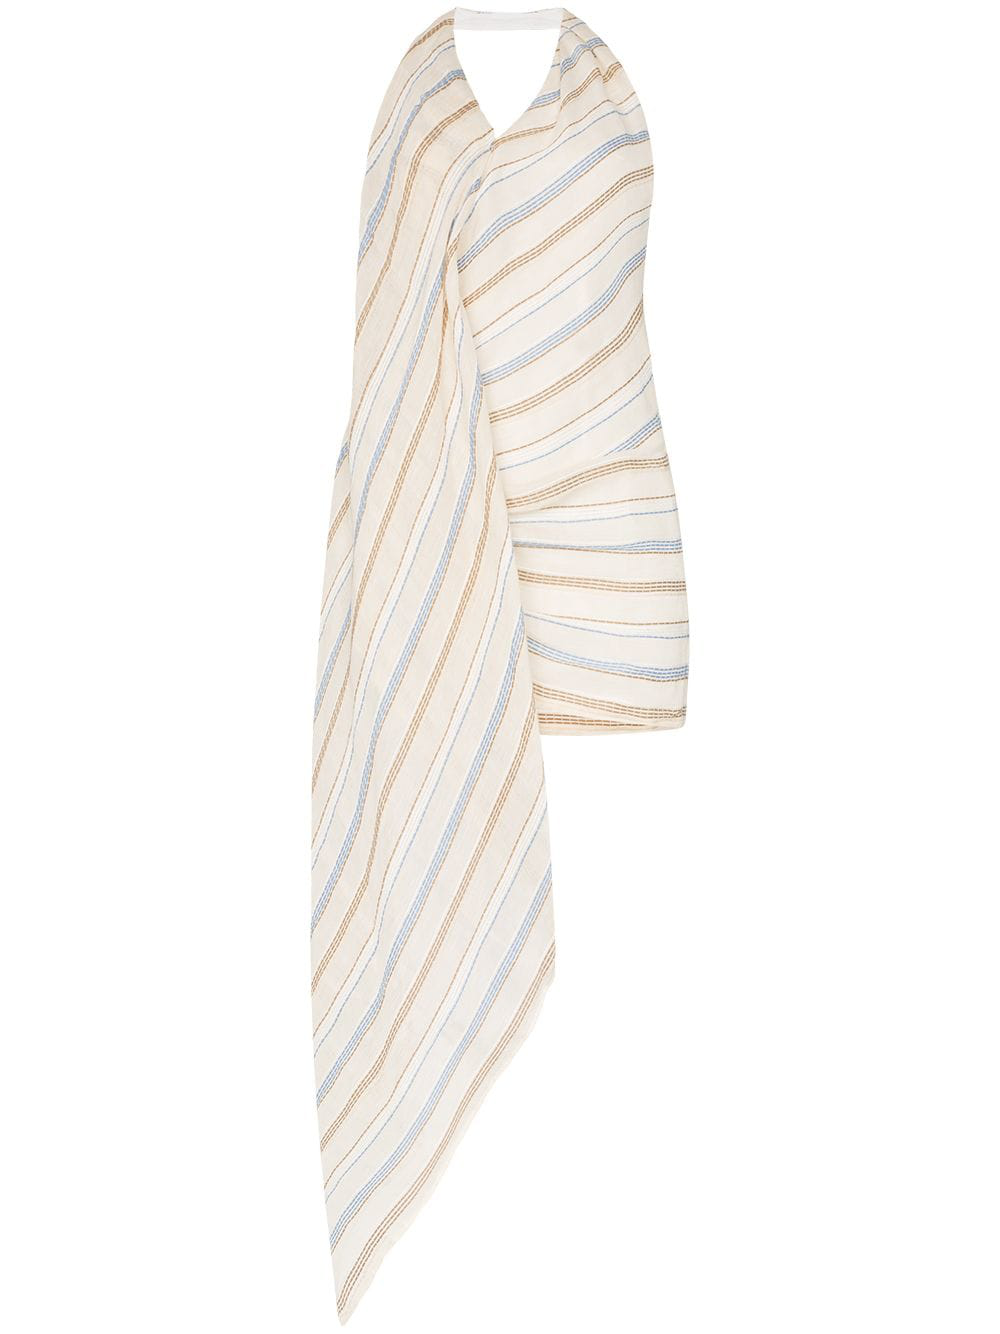 862c90ba665 Jacquemus Spezzia Asymmetric Embroidered Cotton And Linen-Blend Halterneck  Dress In Beige